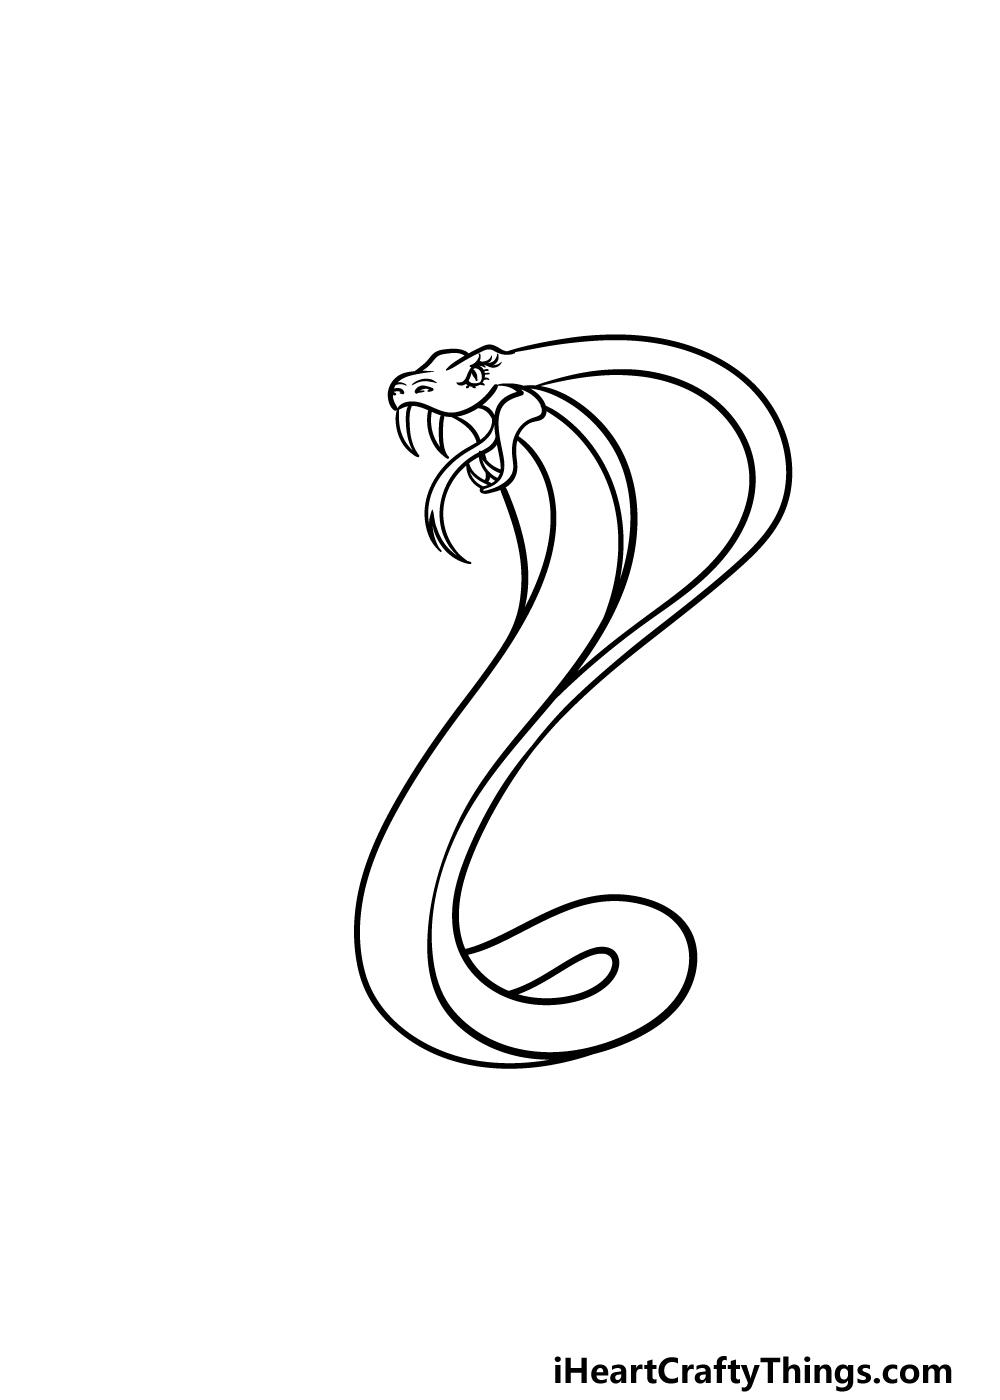 drawing cobra step 2